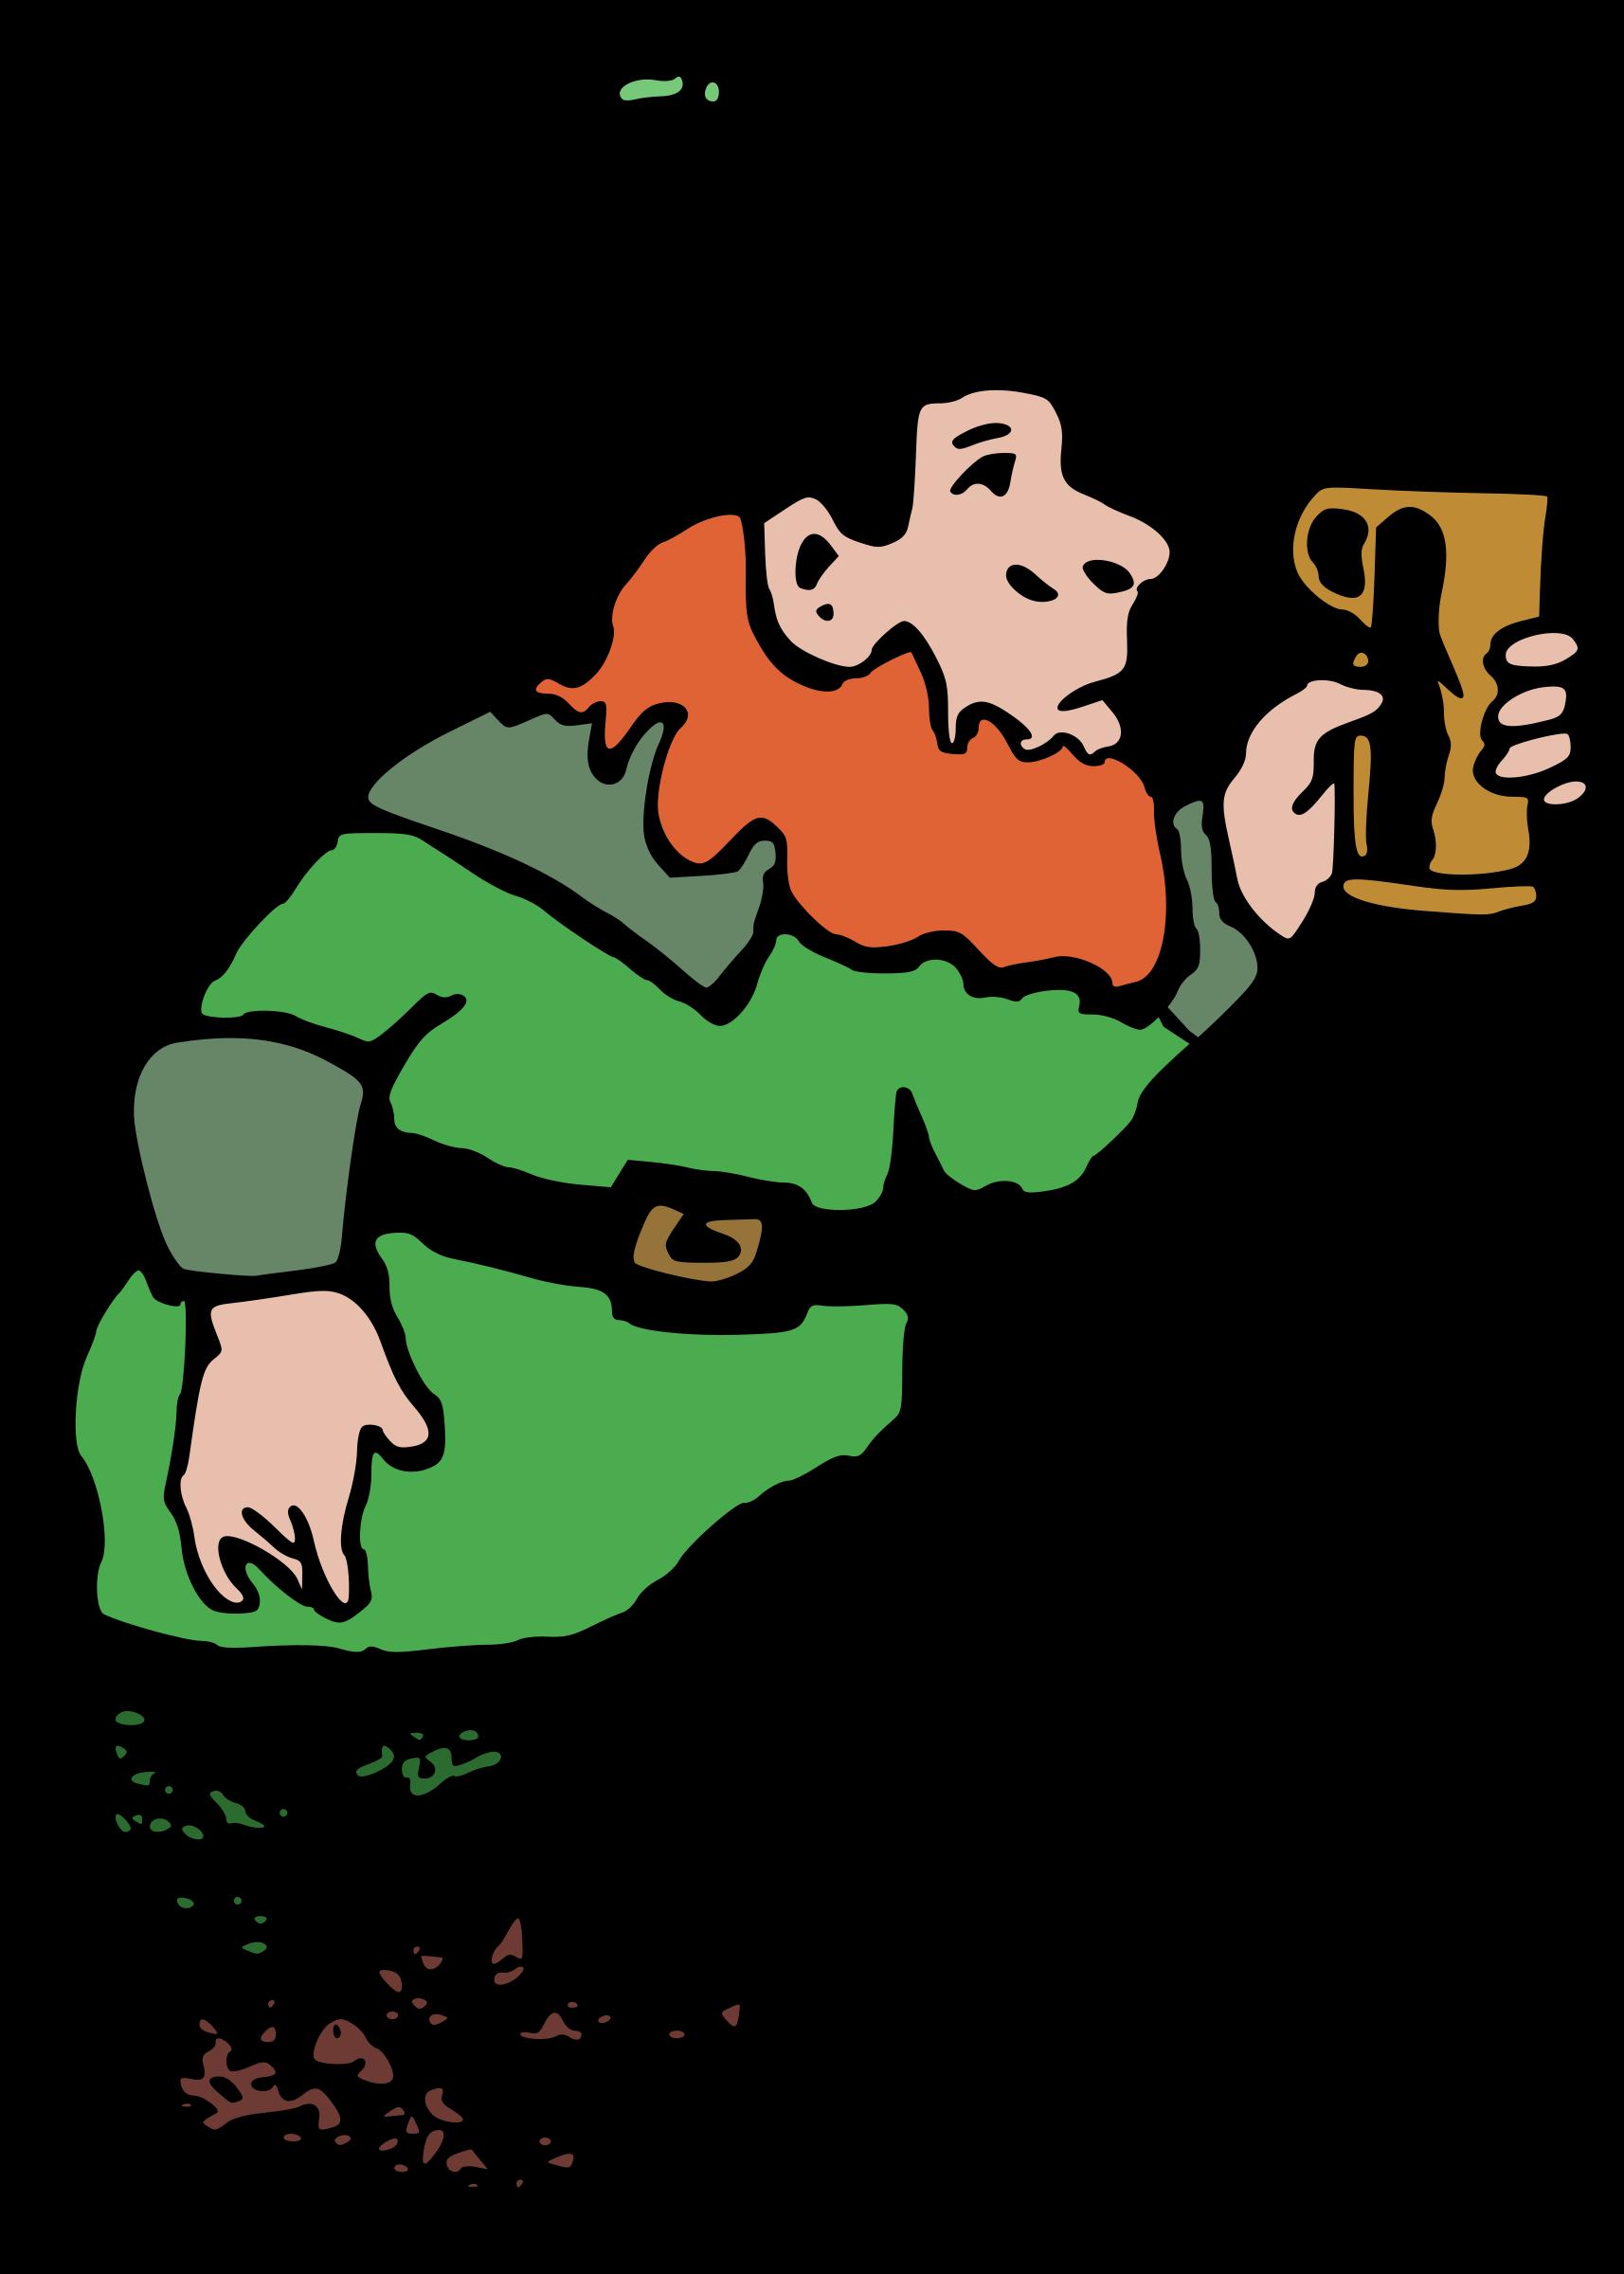 Leprechaun clipart lucky leprechaun. And beer big image